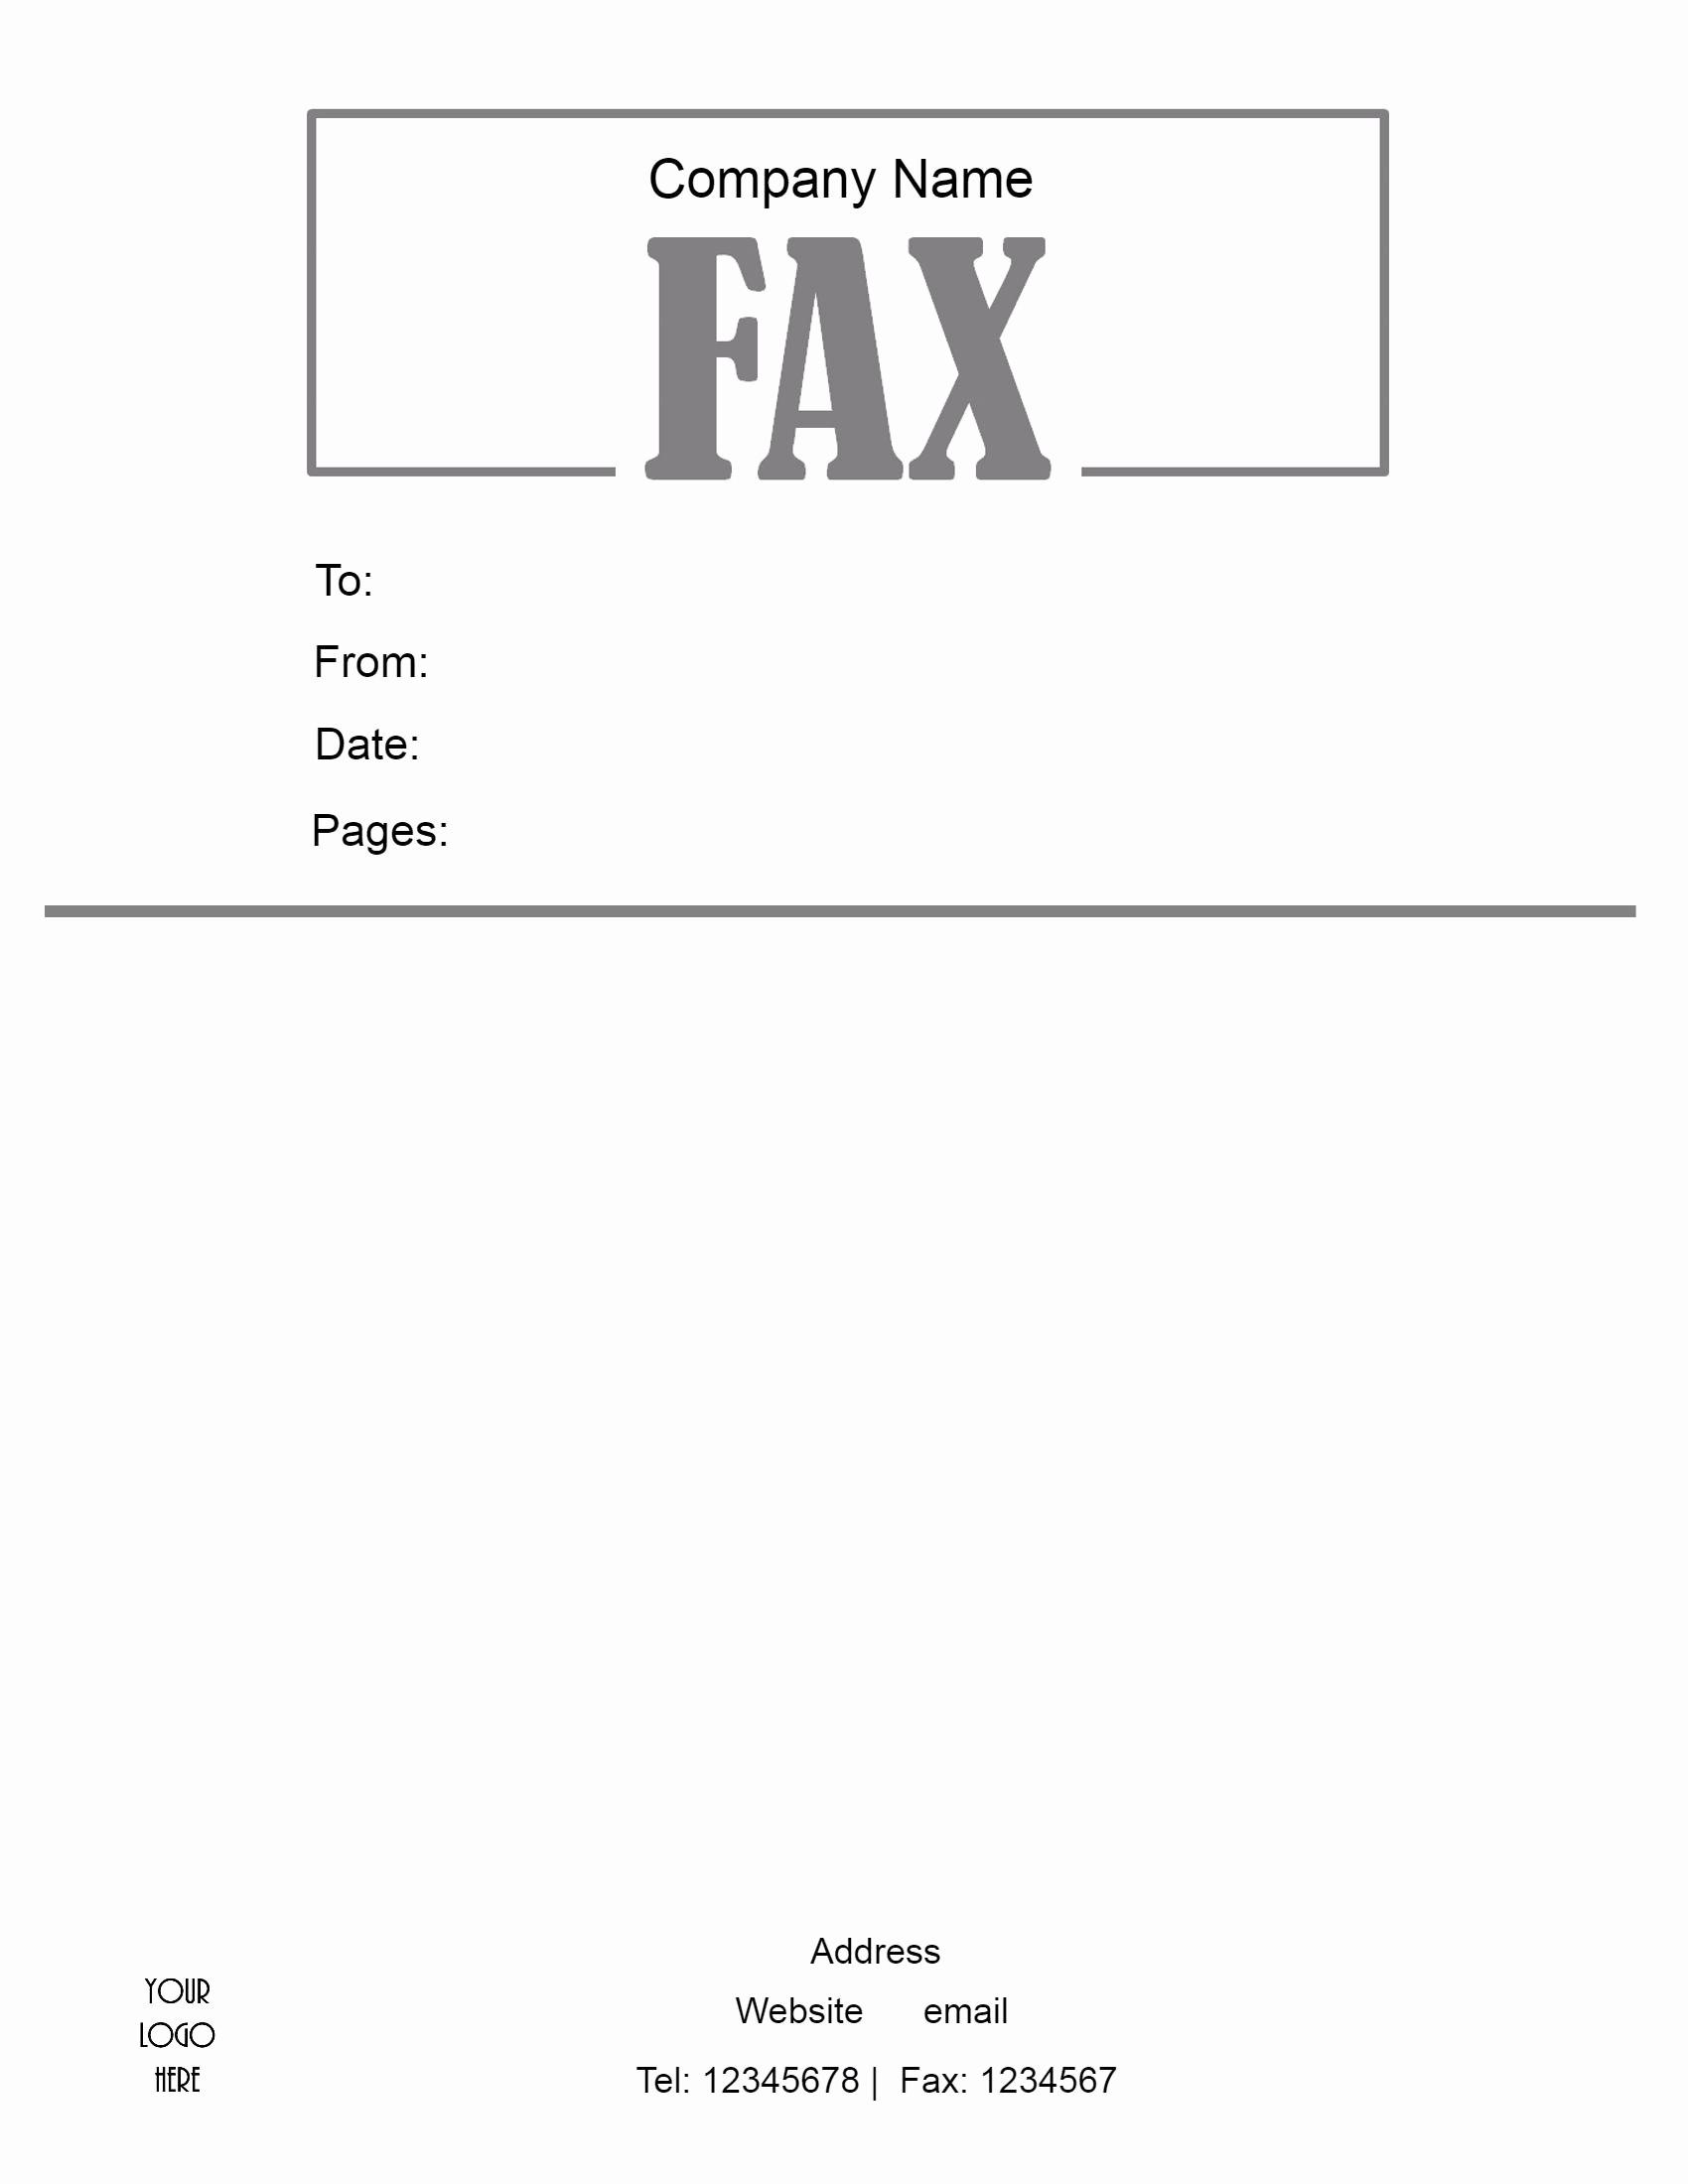 Free Fax Cover Sheet Templates Fresh Free Fax Cover Sheet Template